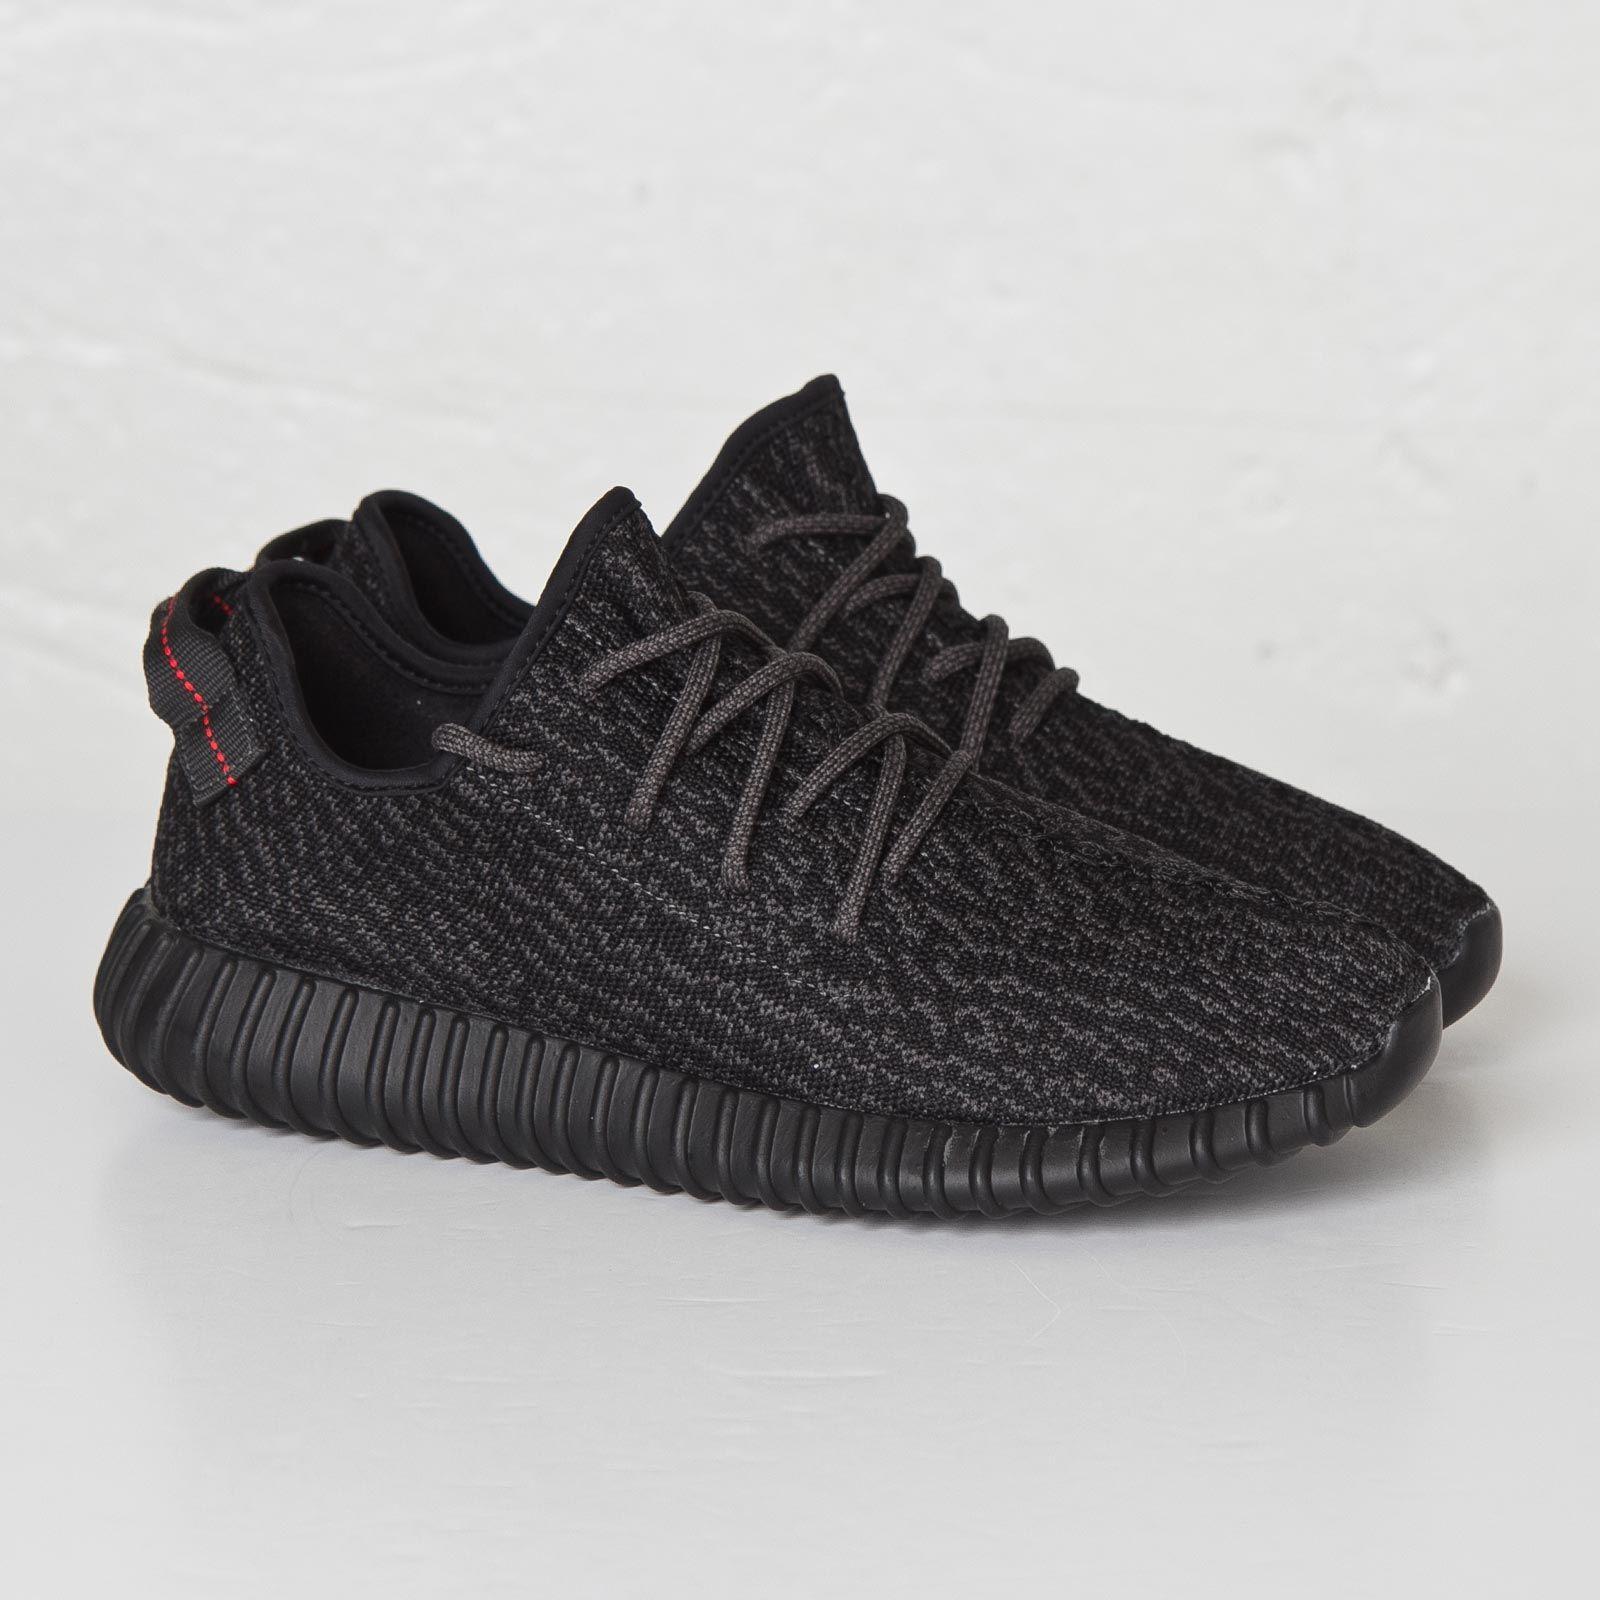 be23784ee12f7 adidas Yeezy Boost 350